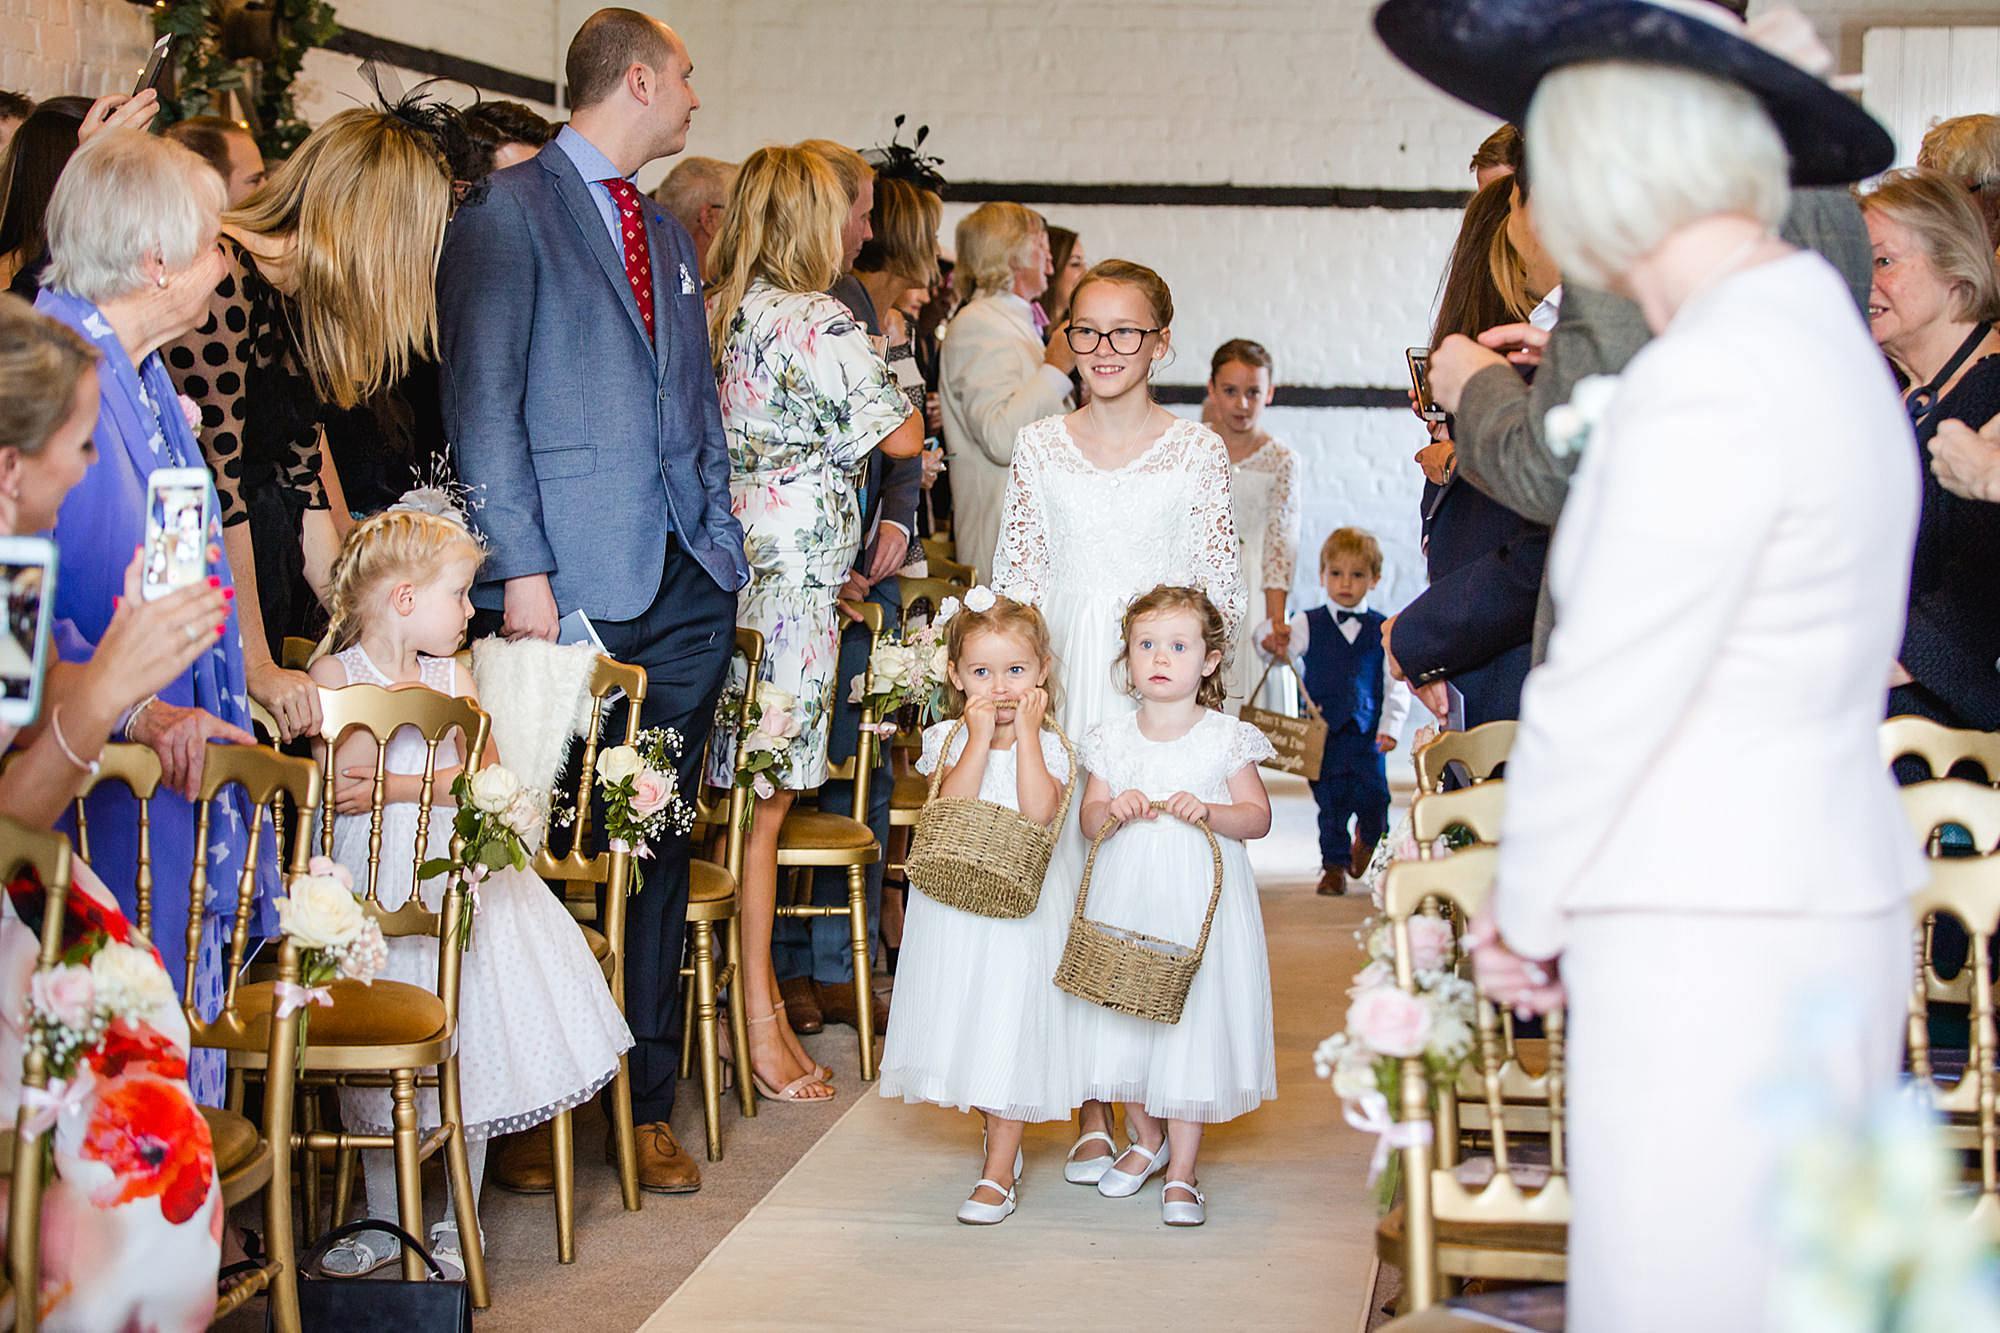 Lillibrooke Manor wedding flower girls walking down the aisle